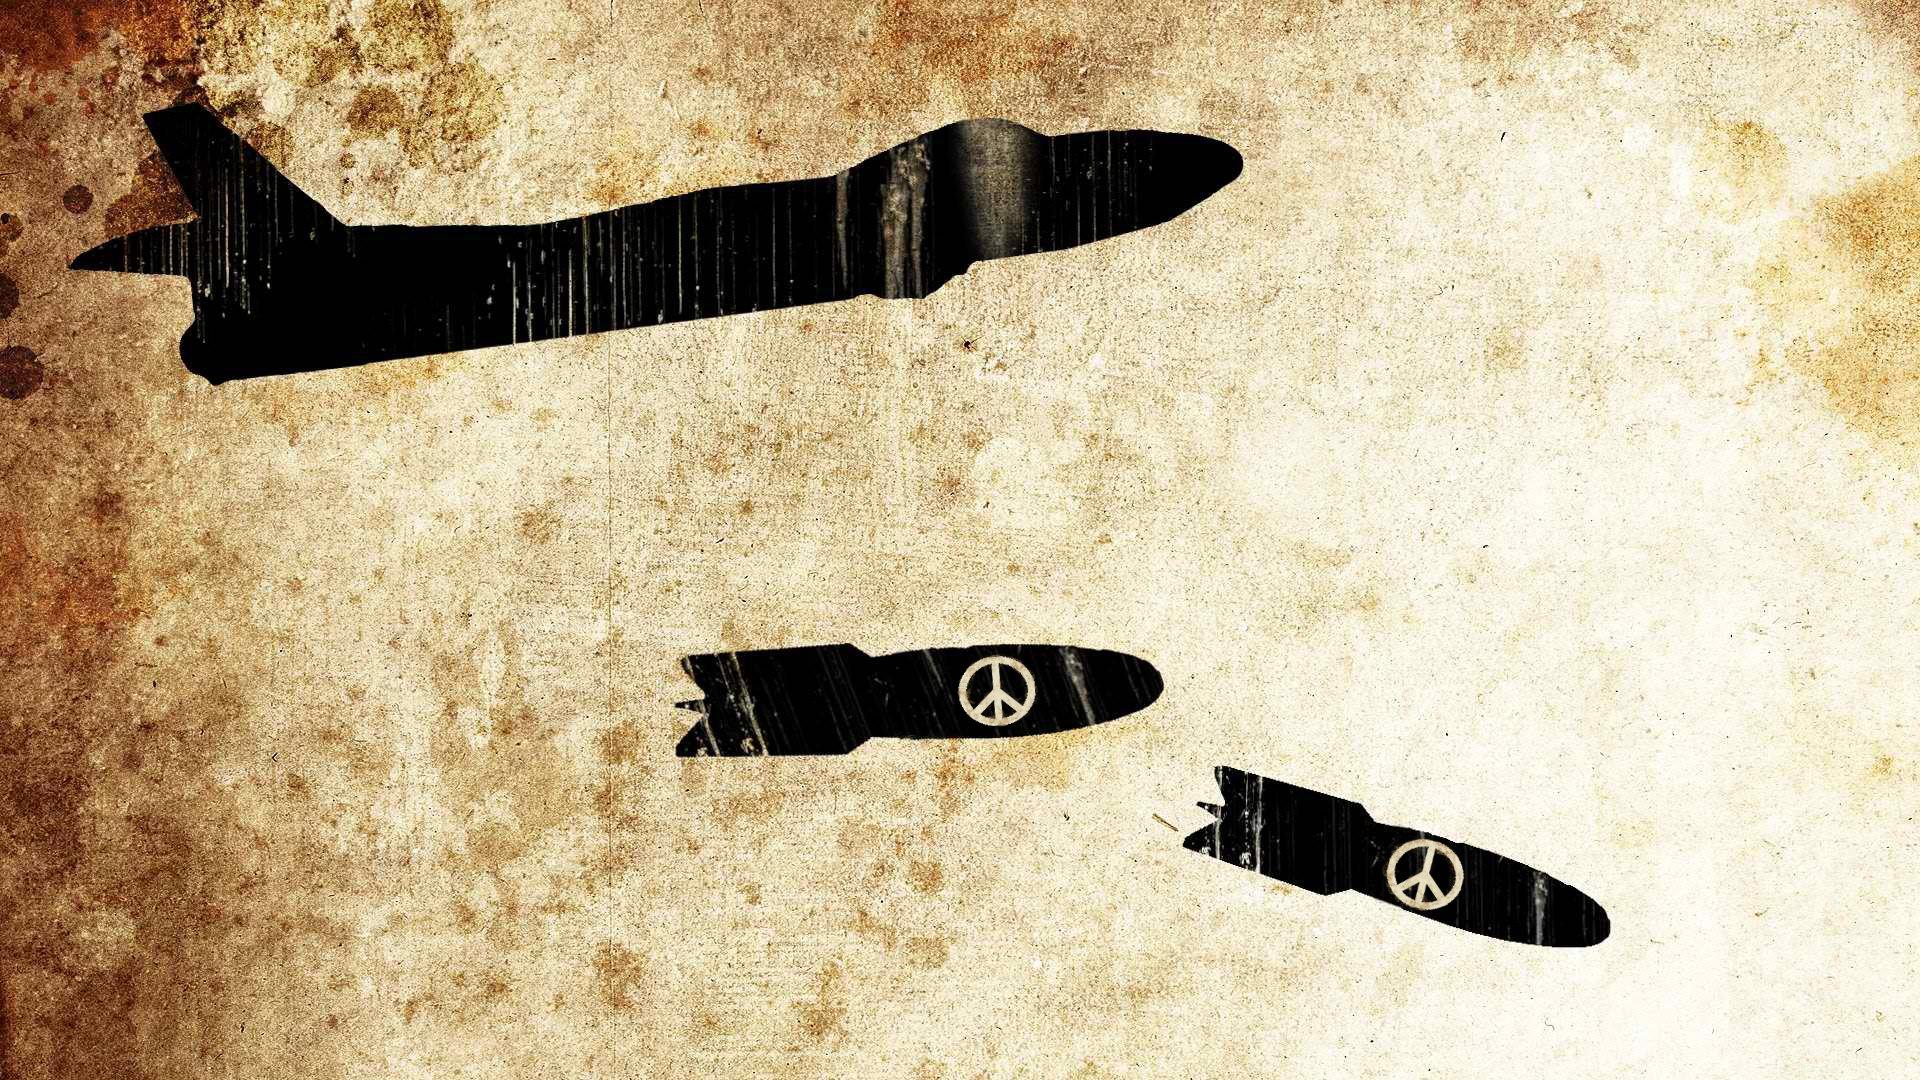 Military - Artistic  Wallpaper